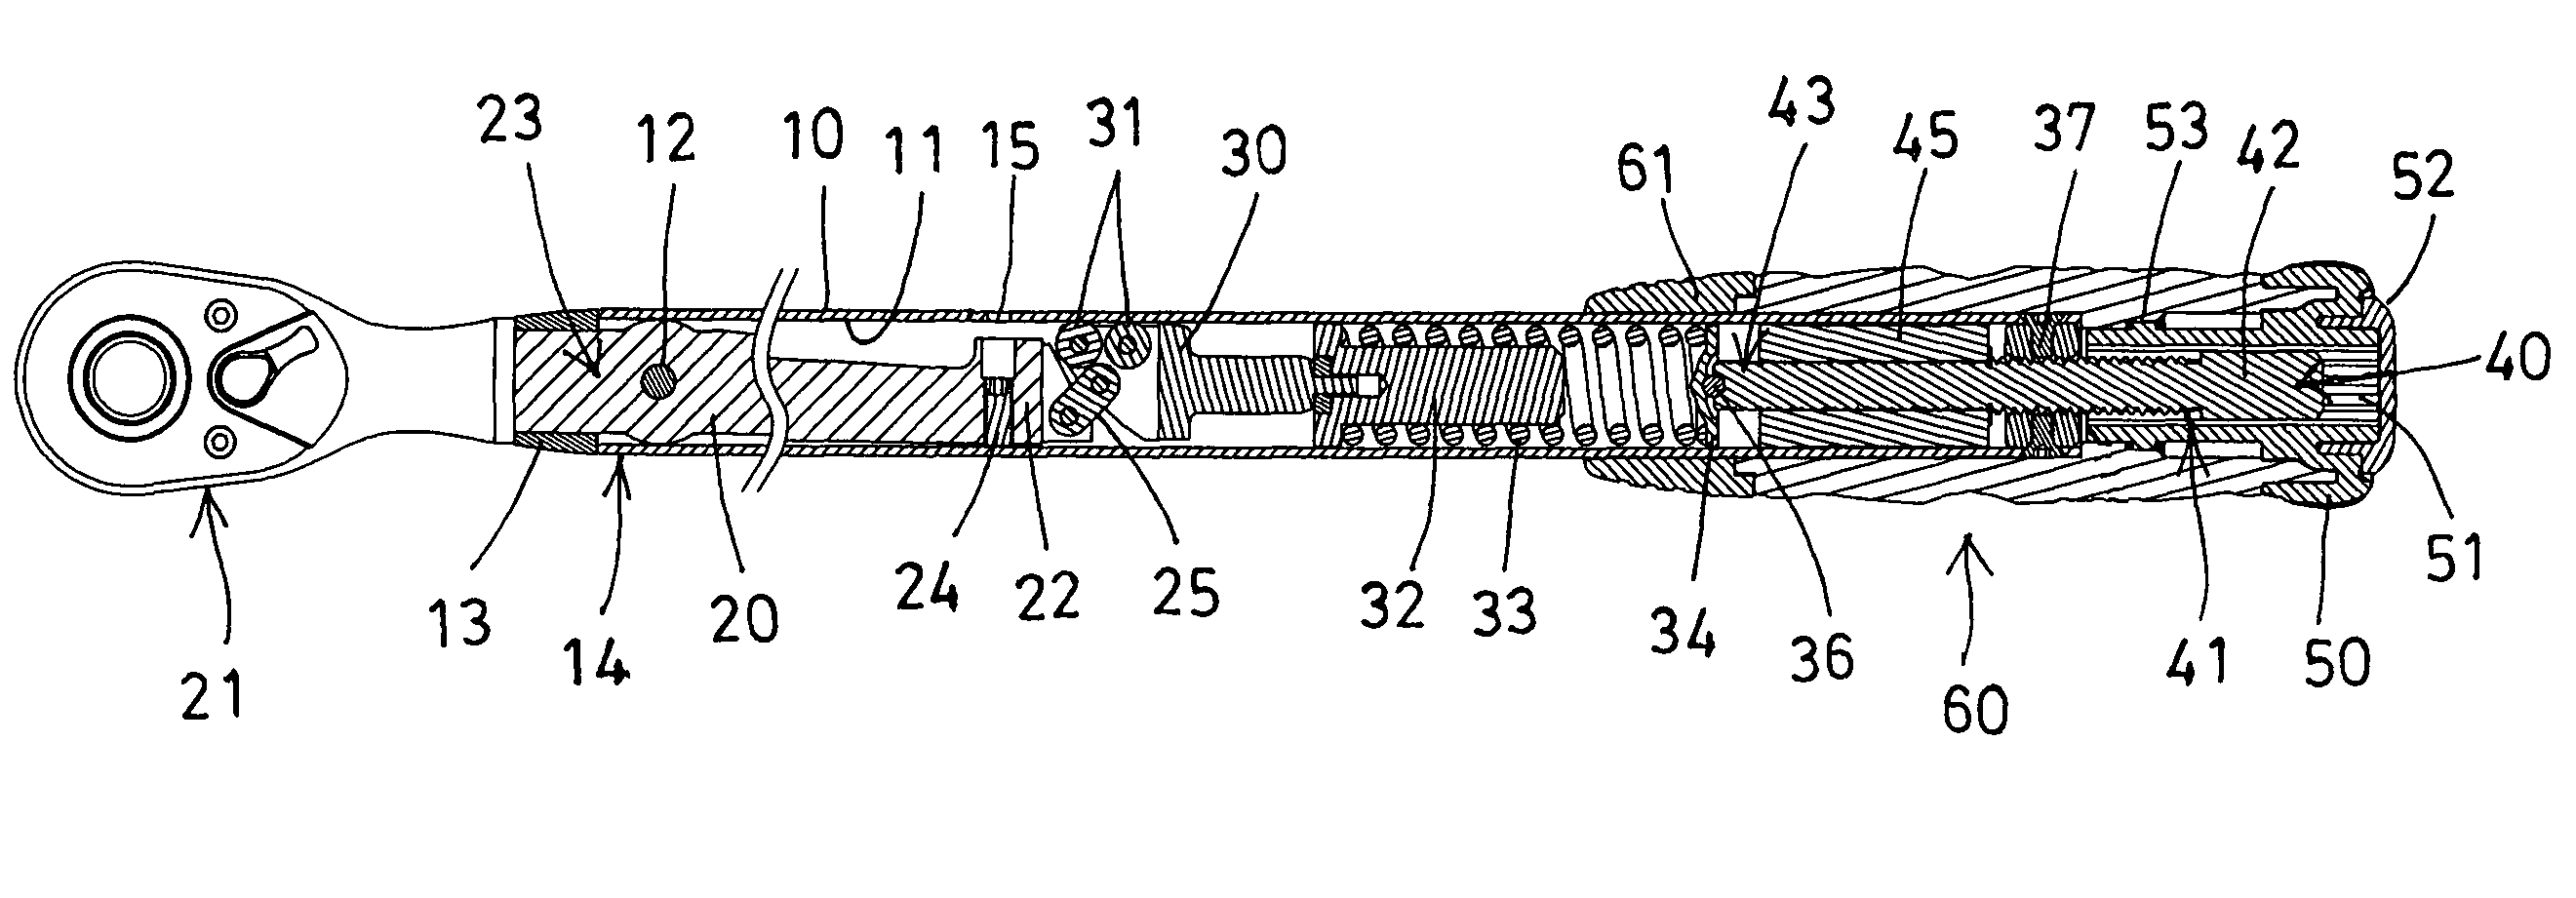 Patent US8245606 - Adjustable torque wrench having lock ...